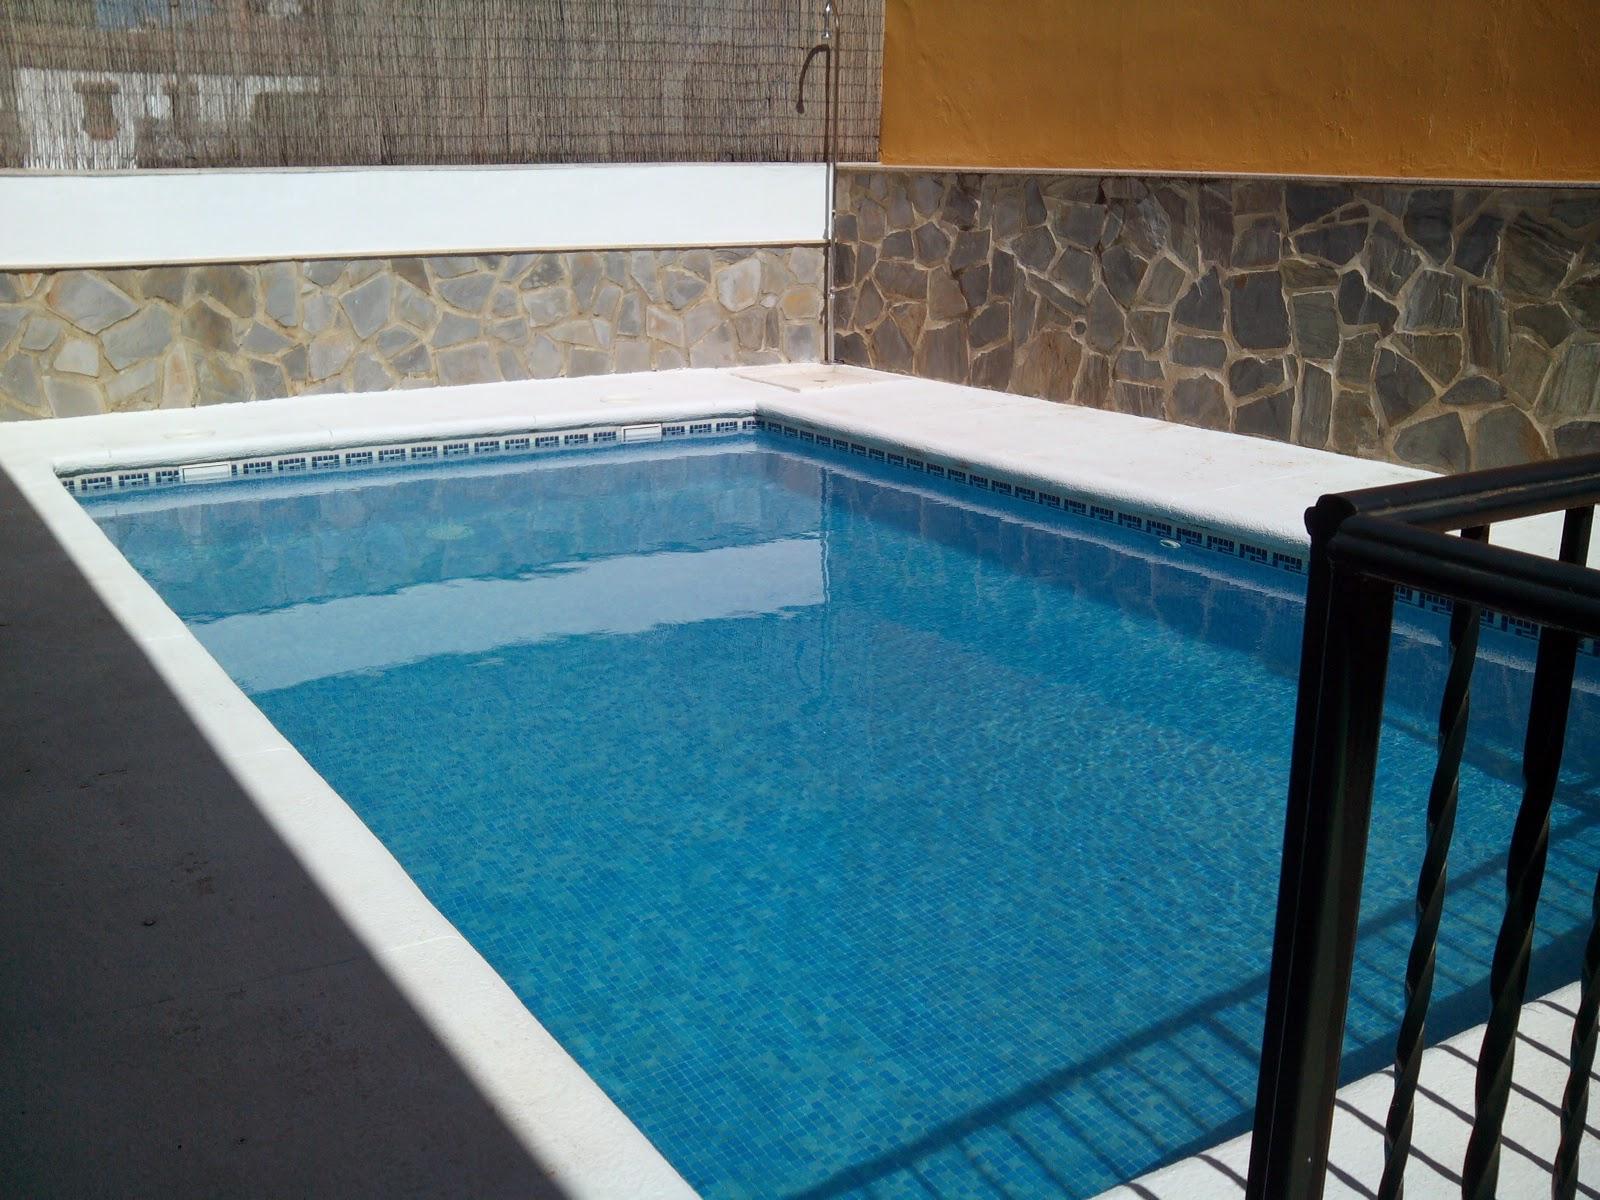 Casa sierra de c diz patio piscina sol rium porche for Barbacoa y piscina madrid